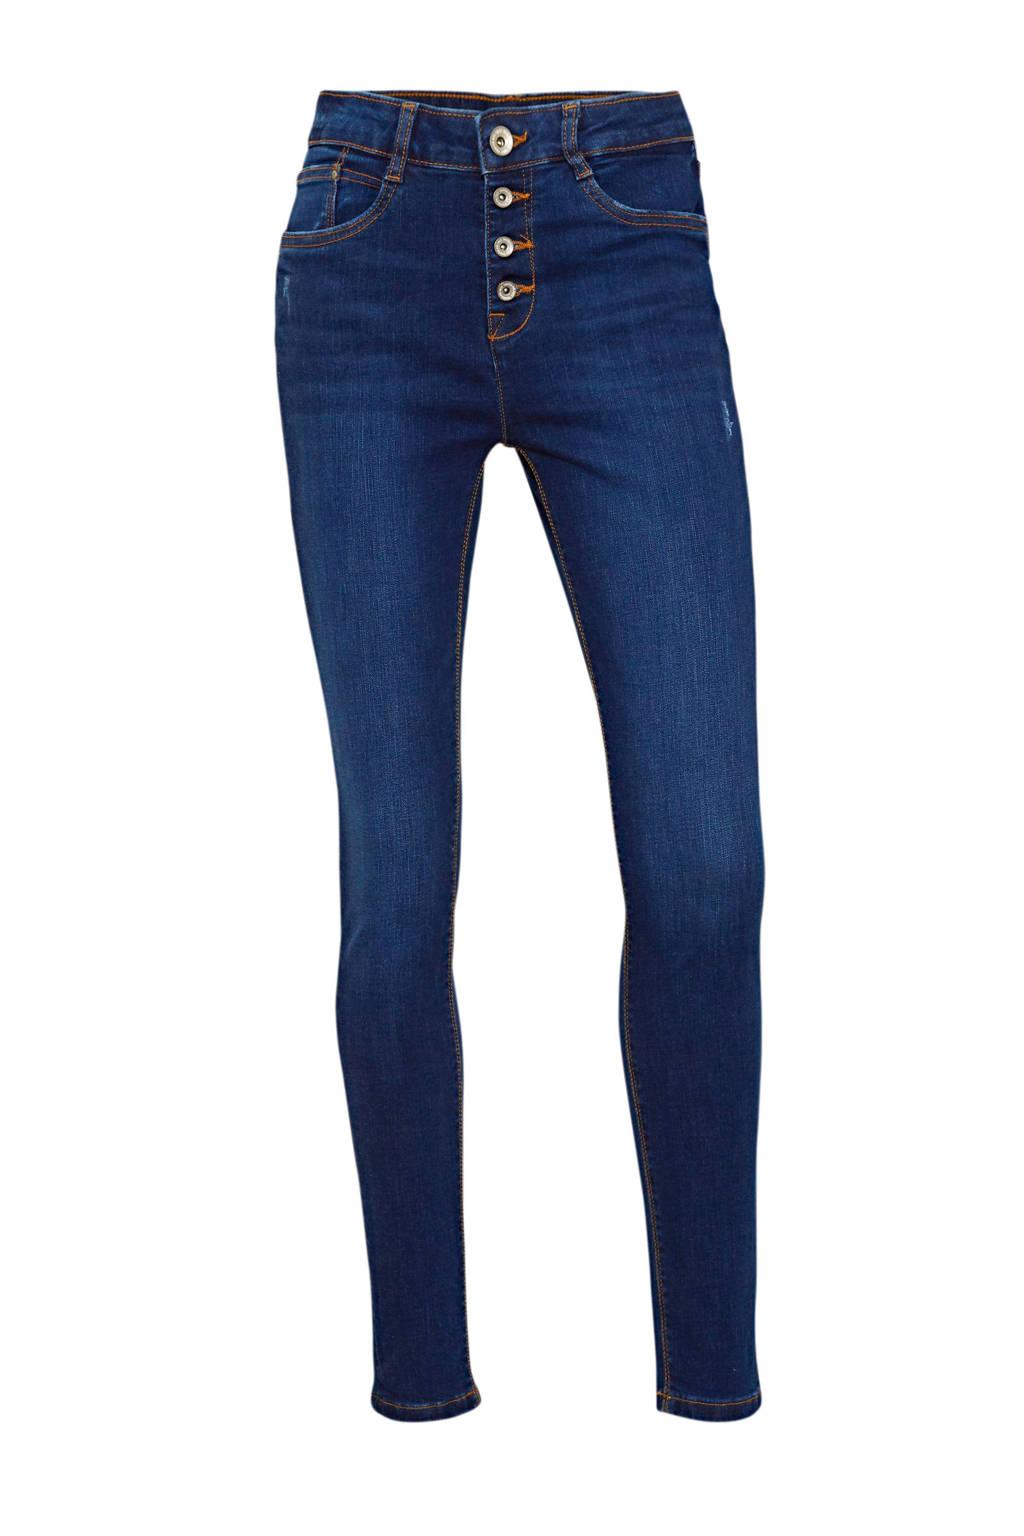 C&A Yessica high waist skinny jeans donkerblauw, Donkerblauw